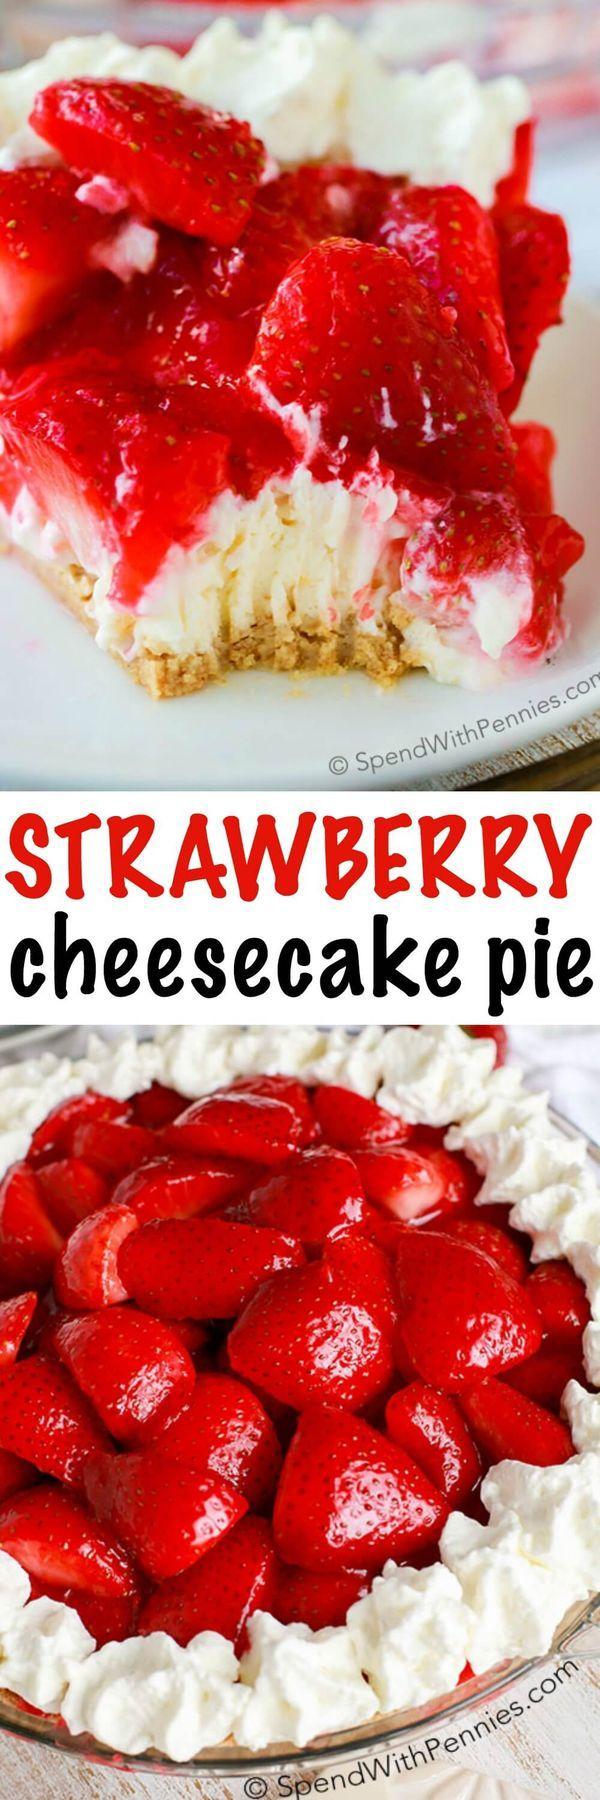 Strawberry Cheesecake Pie (No Bake